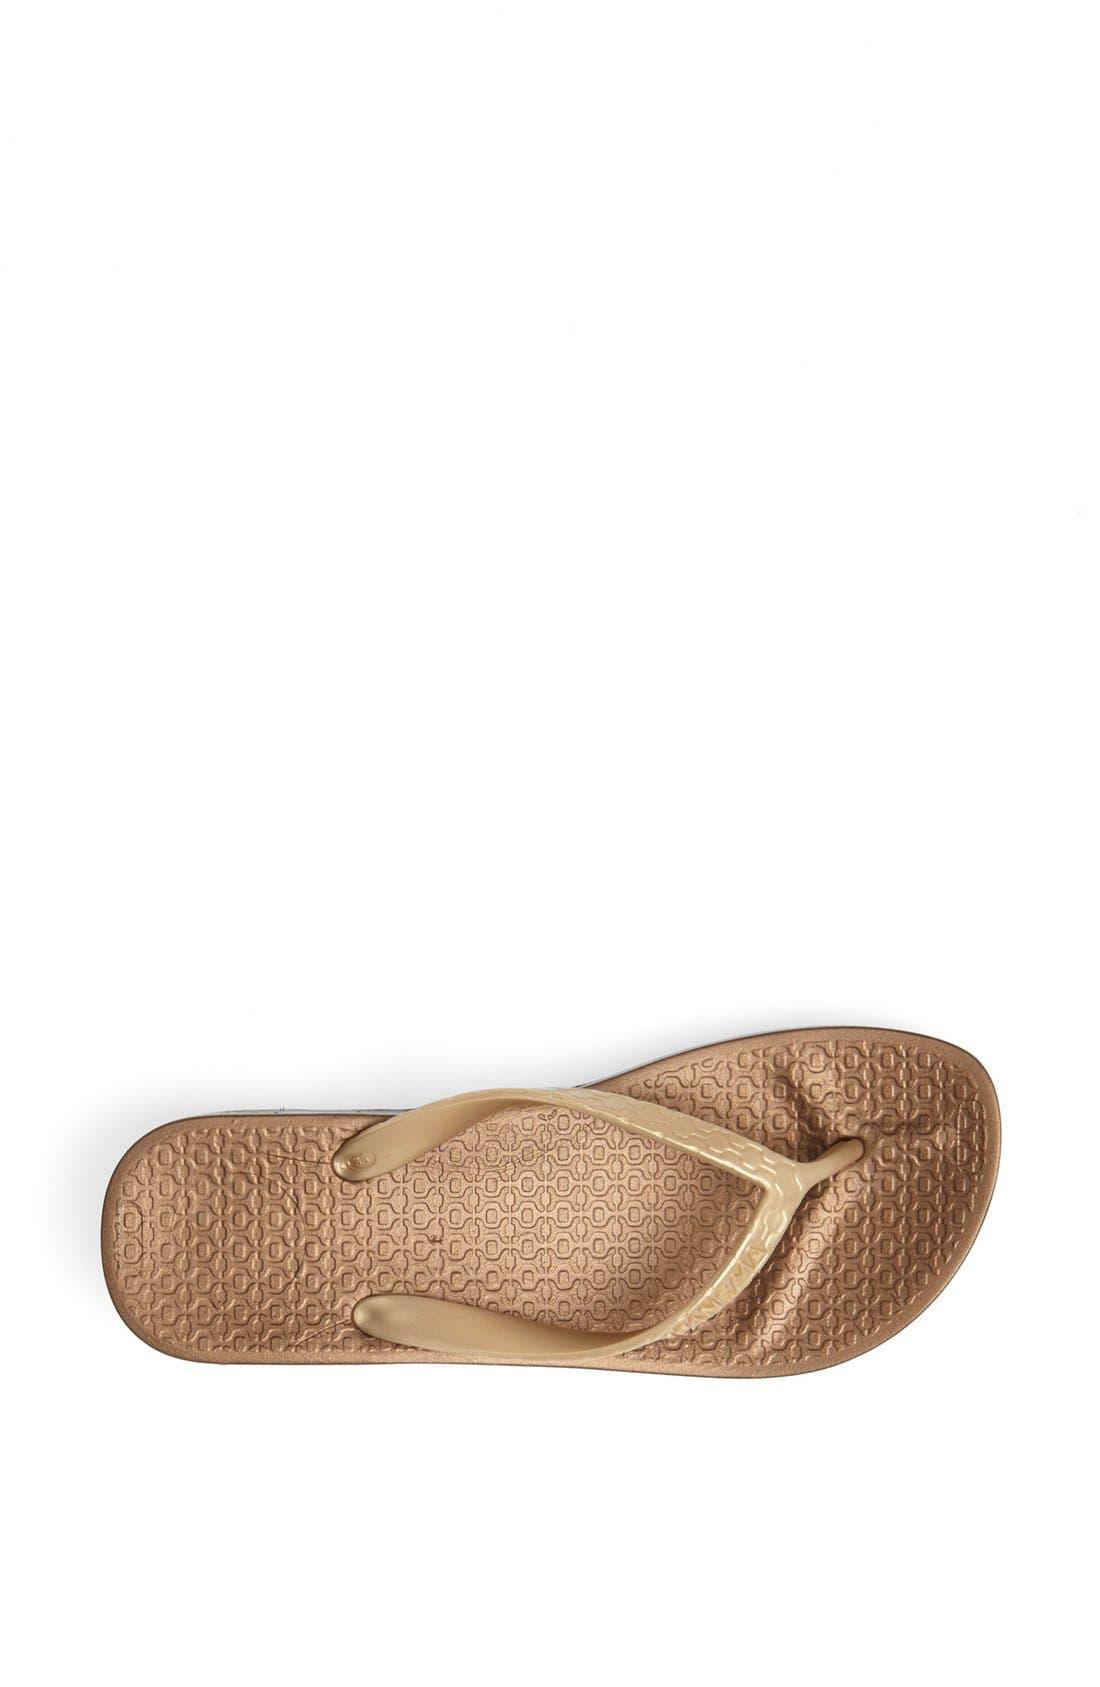 Alternate Image 3  - Ipanema 'Tropical' Flip Flop